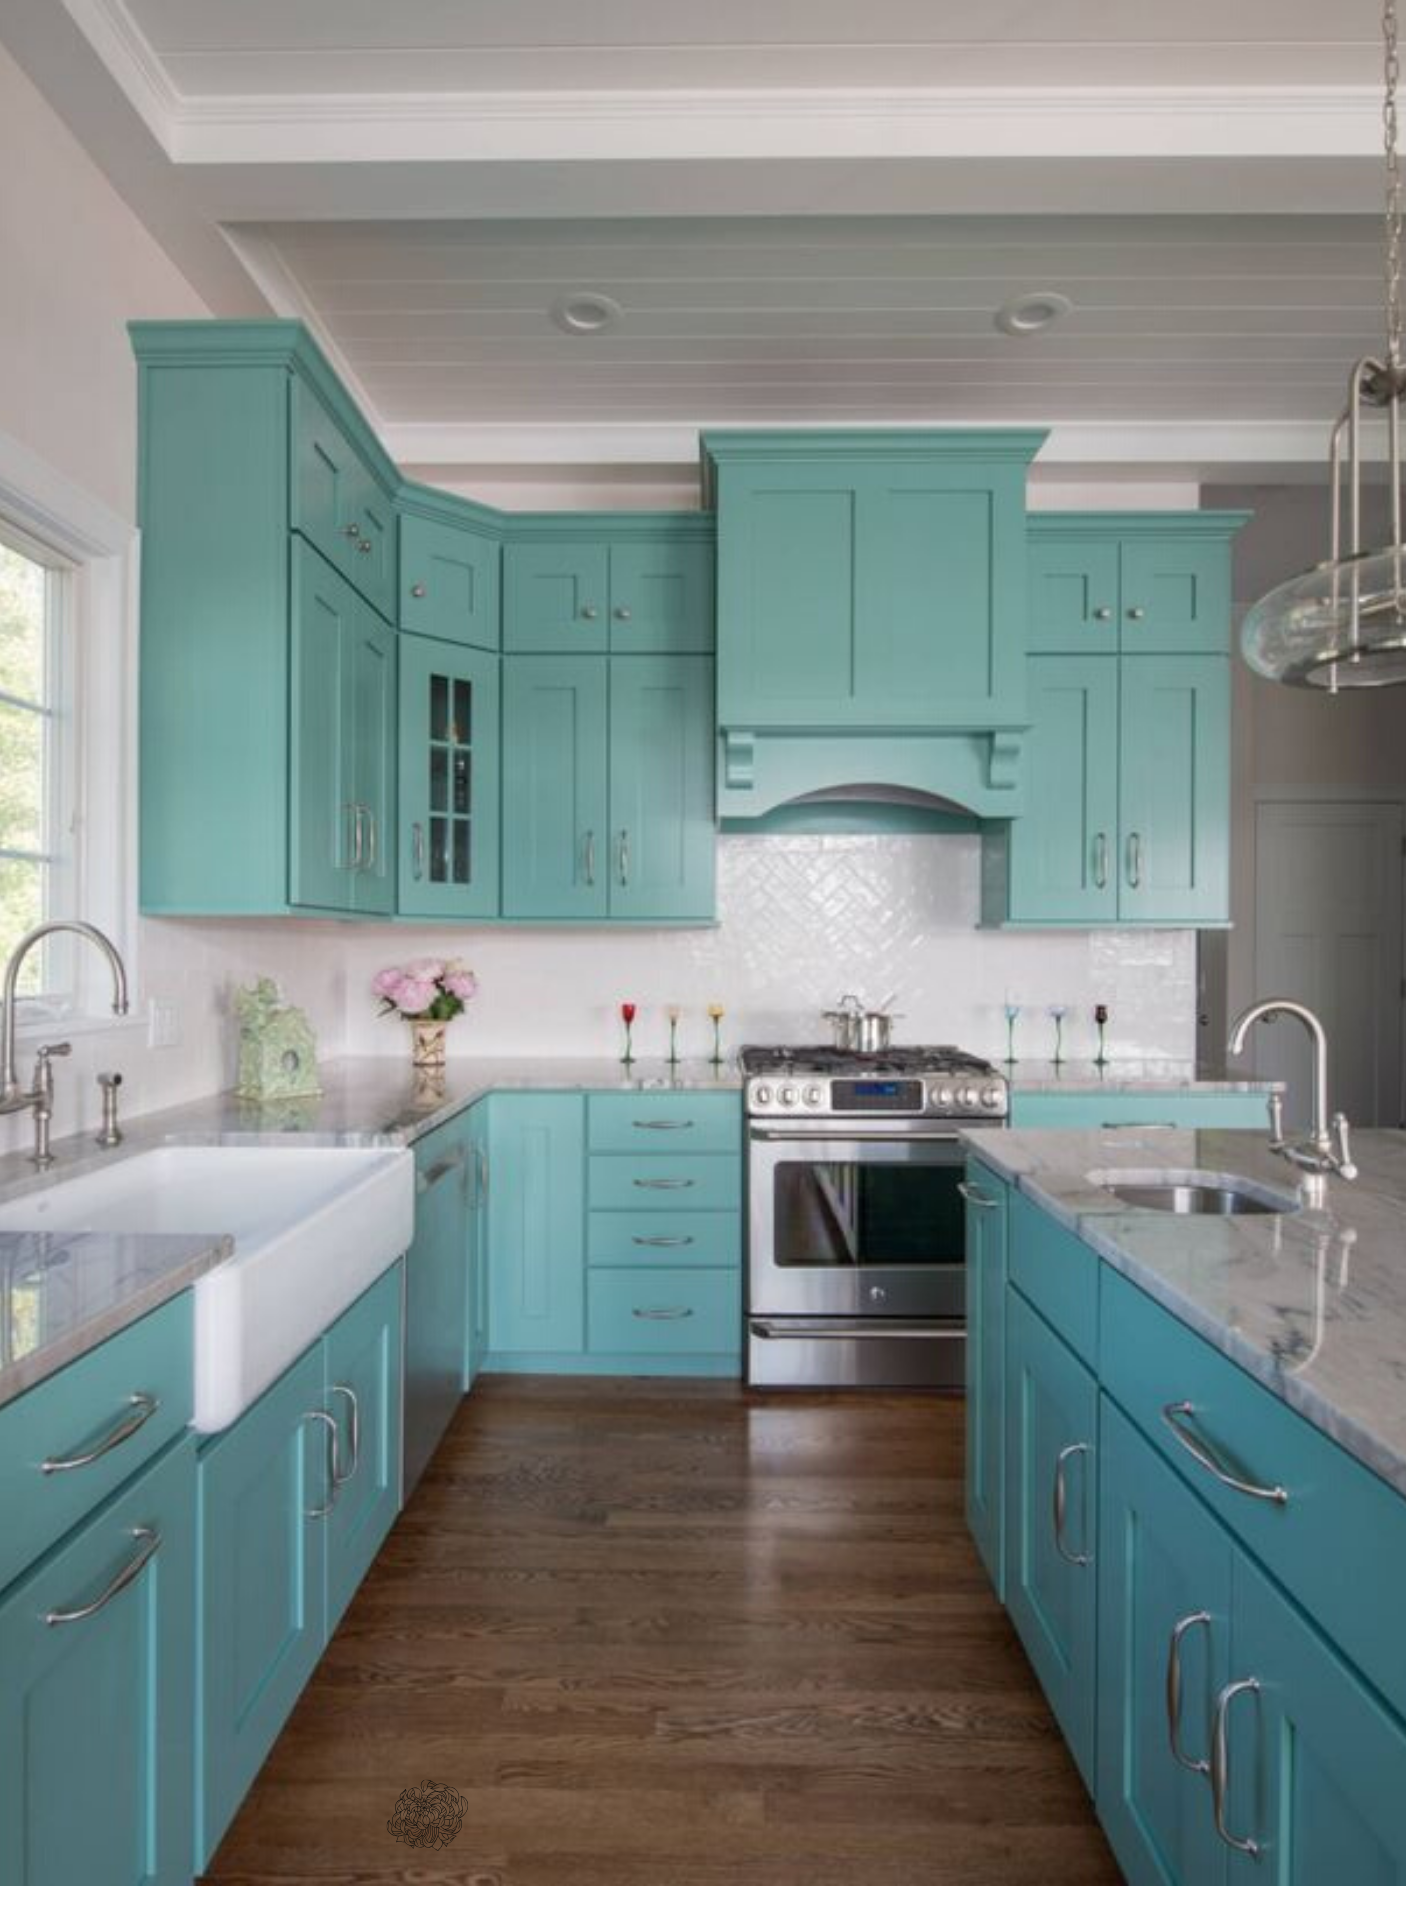 Blue Findekskredim Com In 2020 Turquoise Kitchen Cabinets Teal Kitchen Cabinets Turquoise Kitchen